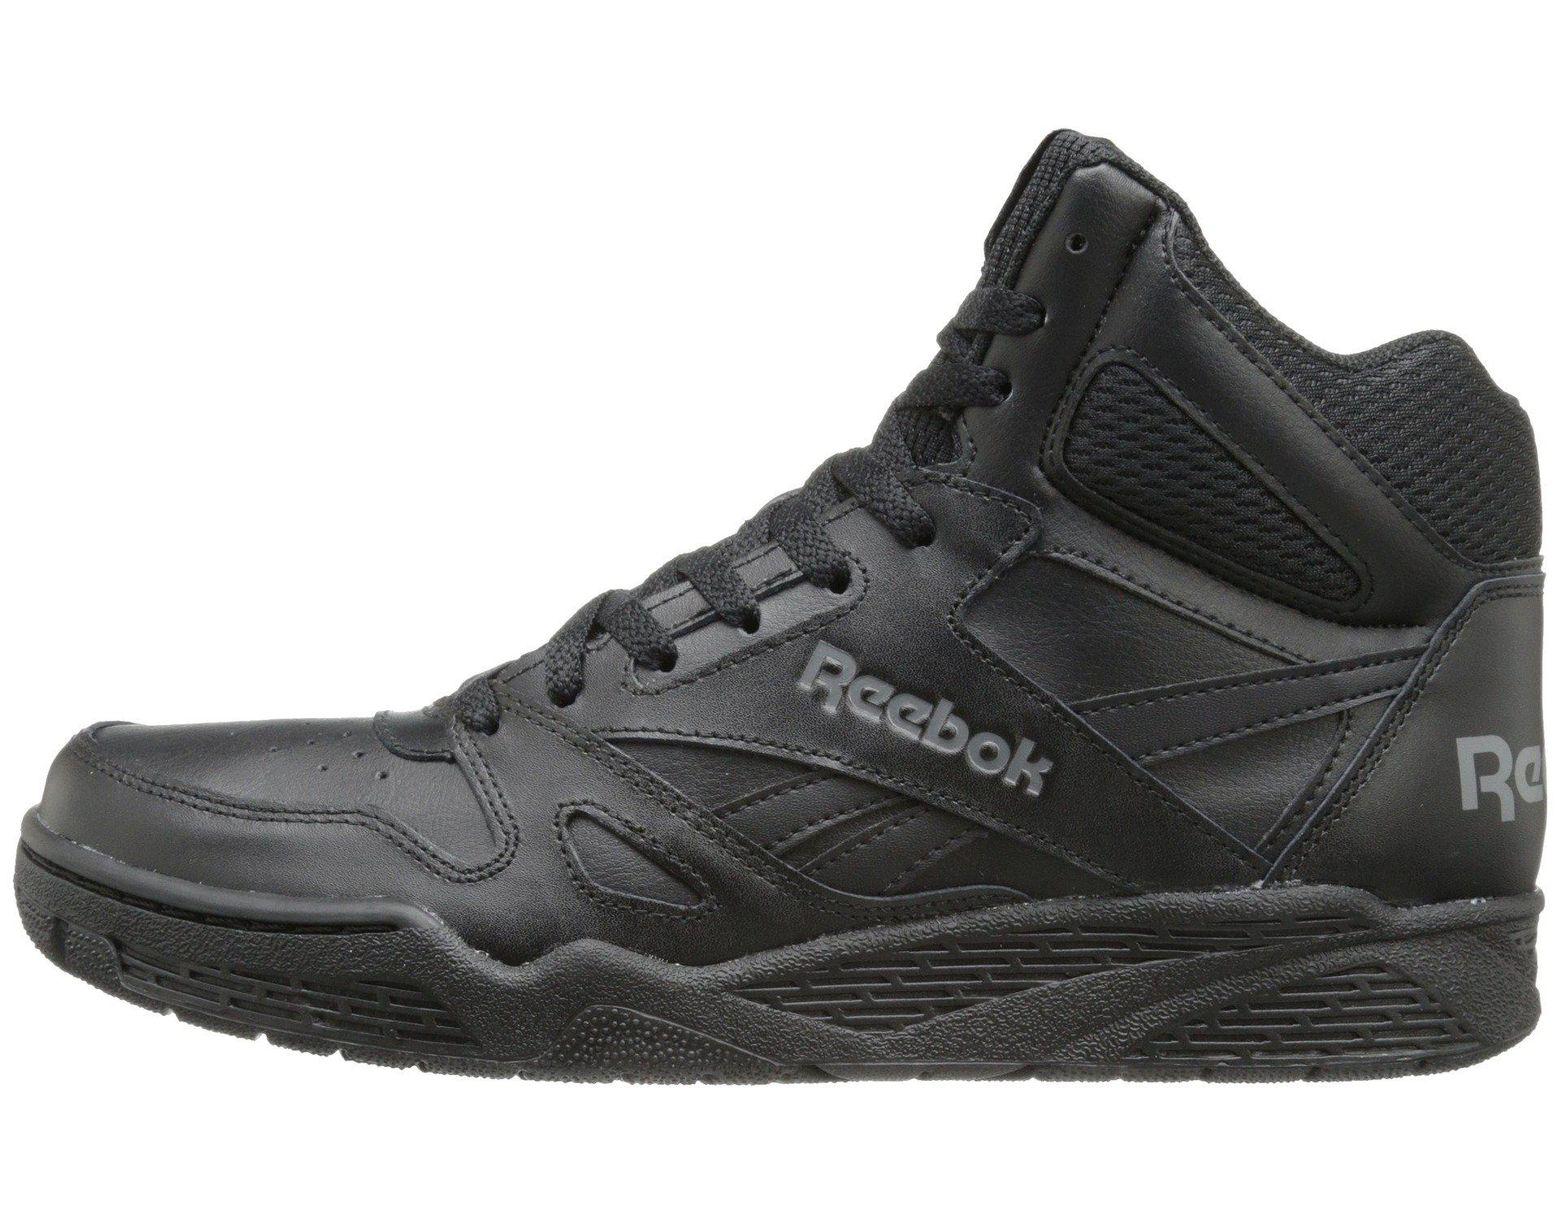 0e9f7dc3a7e Lyst - Reebok Royal Bb4500 Hi (black shark) Men s Basketball Shoes in Black  for Men - Save 28%